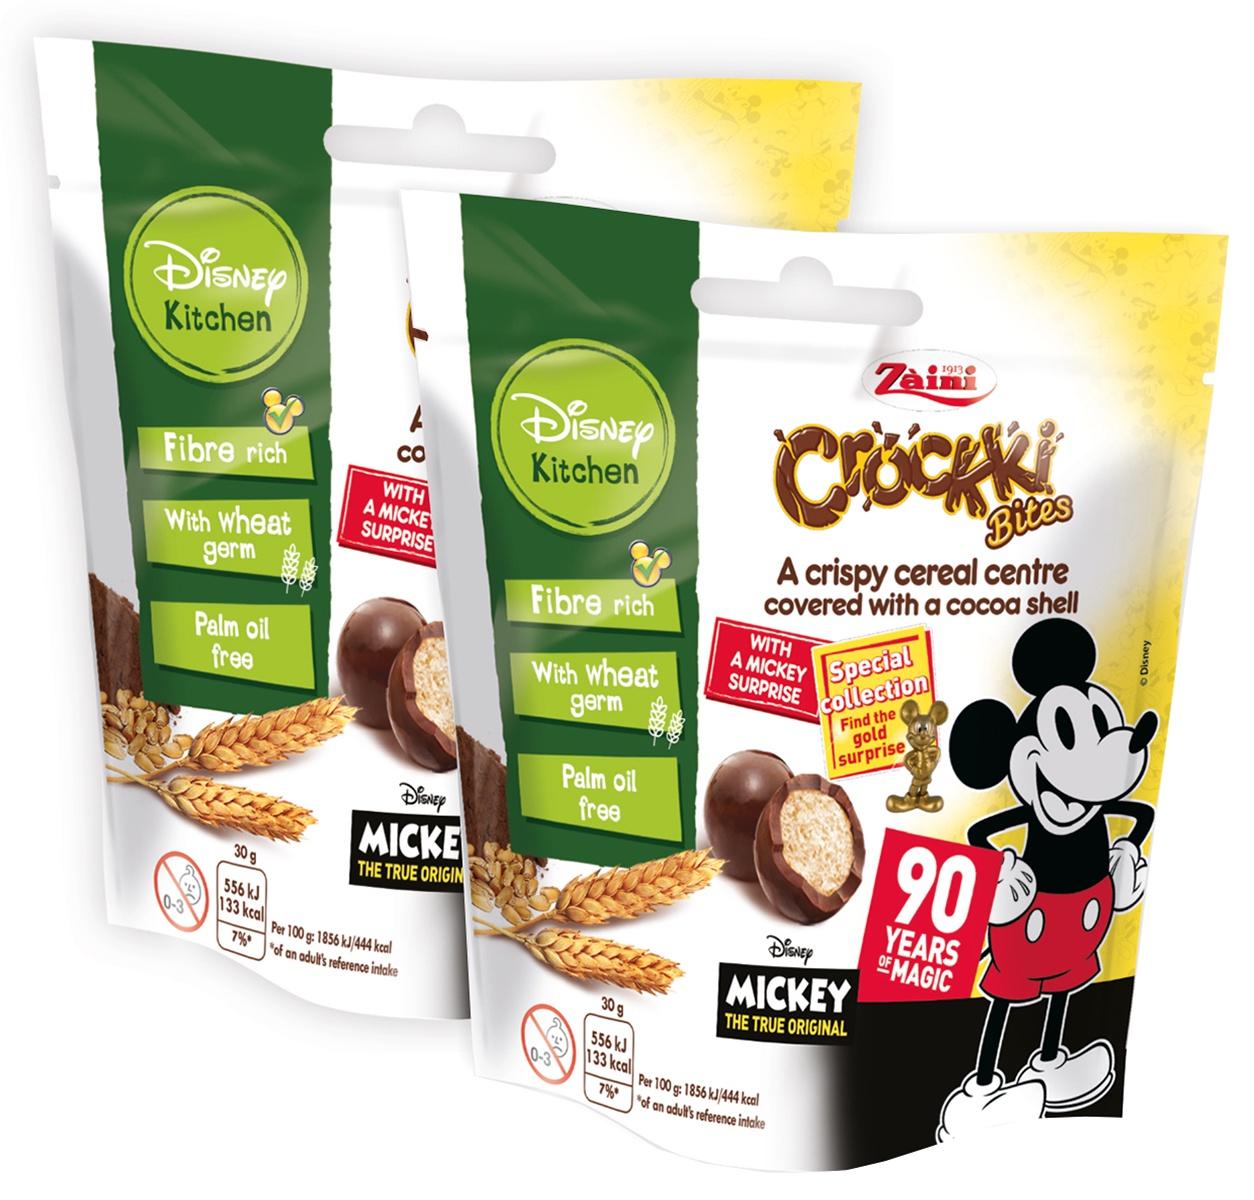 Хрустящие шарики BITES COCOA MICKEY Zaini PF0138, с коллекционной игрушкой внутри, покрытые какао, 2шт*30гр zaini choco